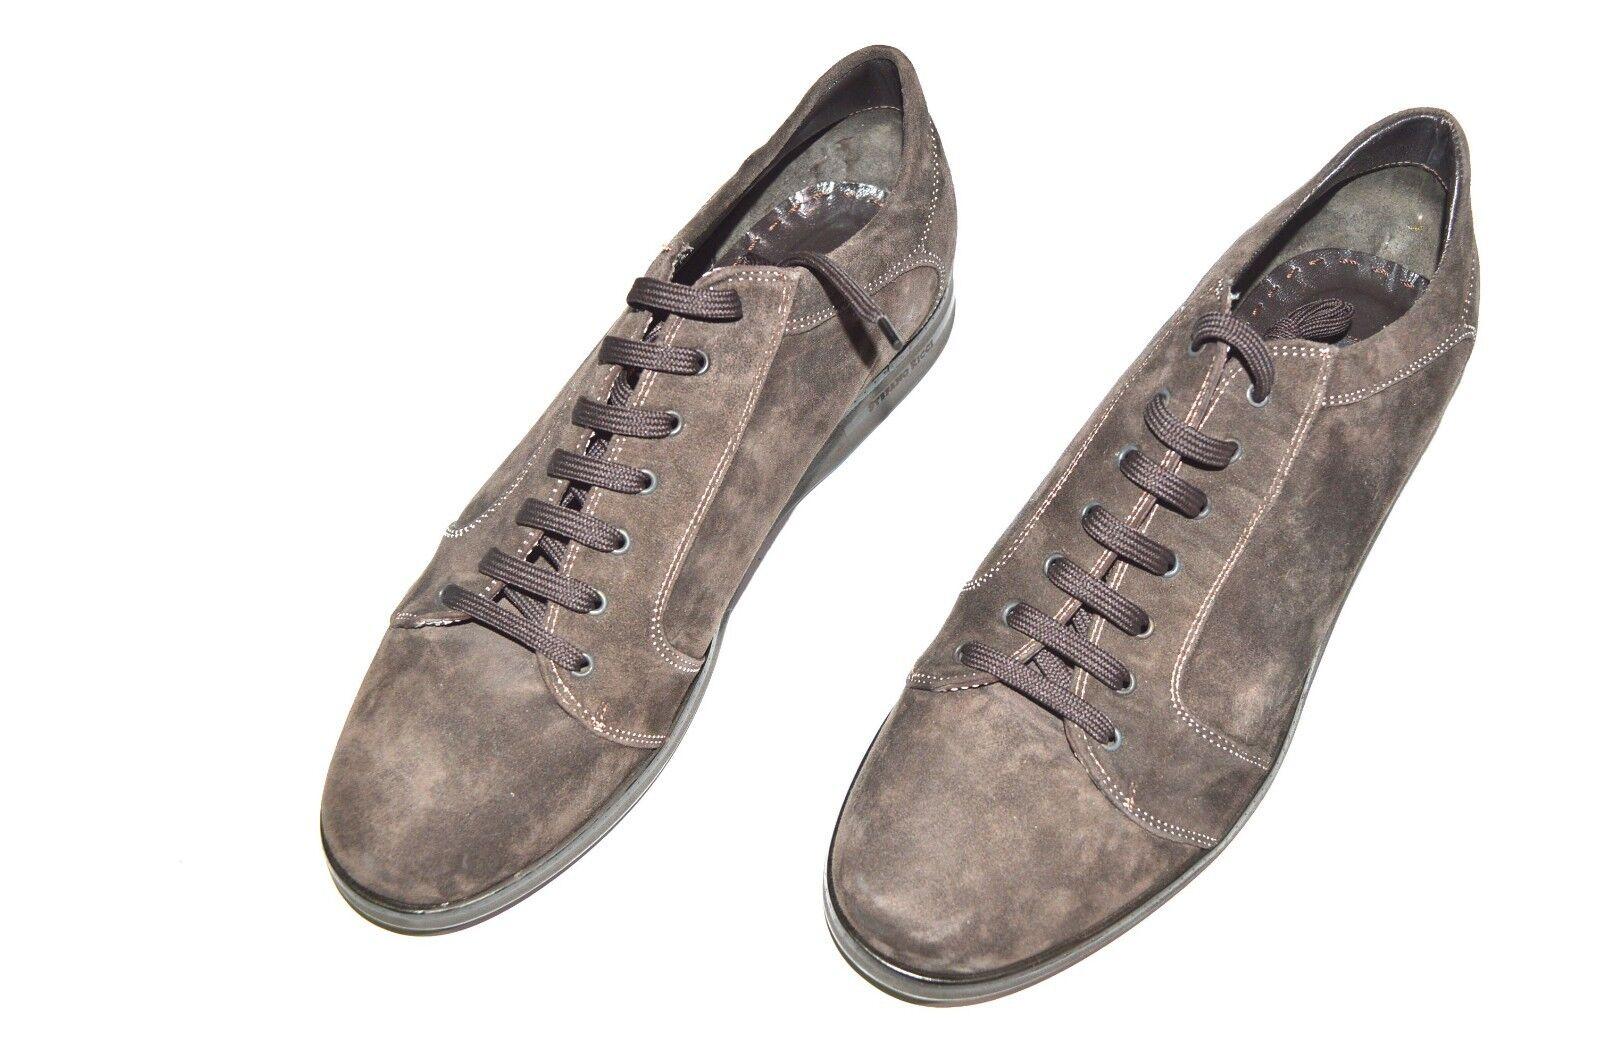 NEW  STEFANO RICCI Suede  shoes Size Eu 42 Us 9 (Cod S405A)